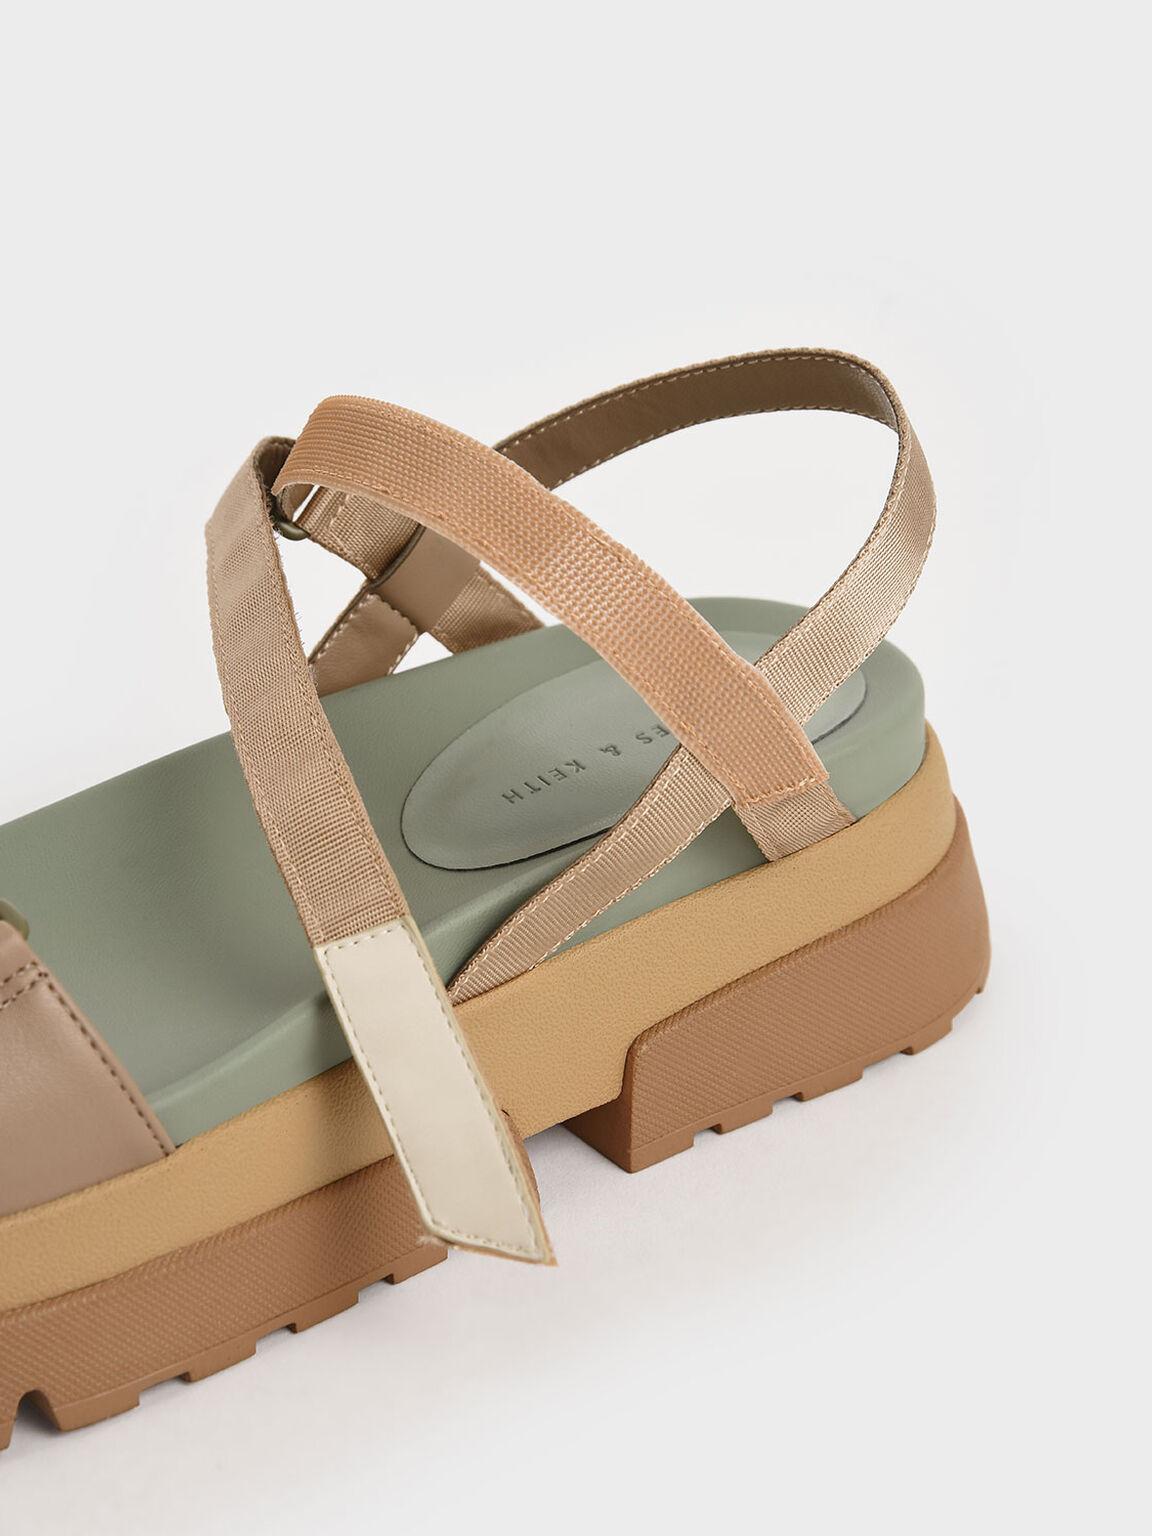 Mesh & Grosgrain Flatform Sandals, Nude, hi-res